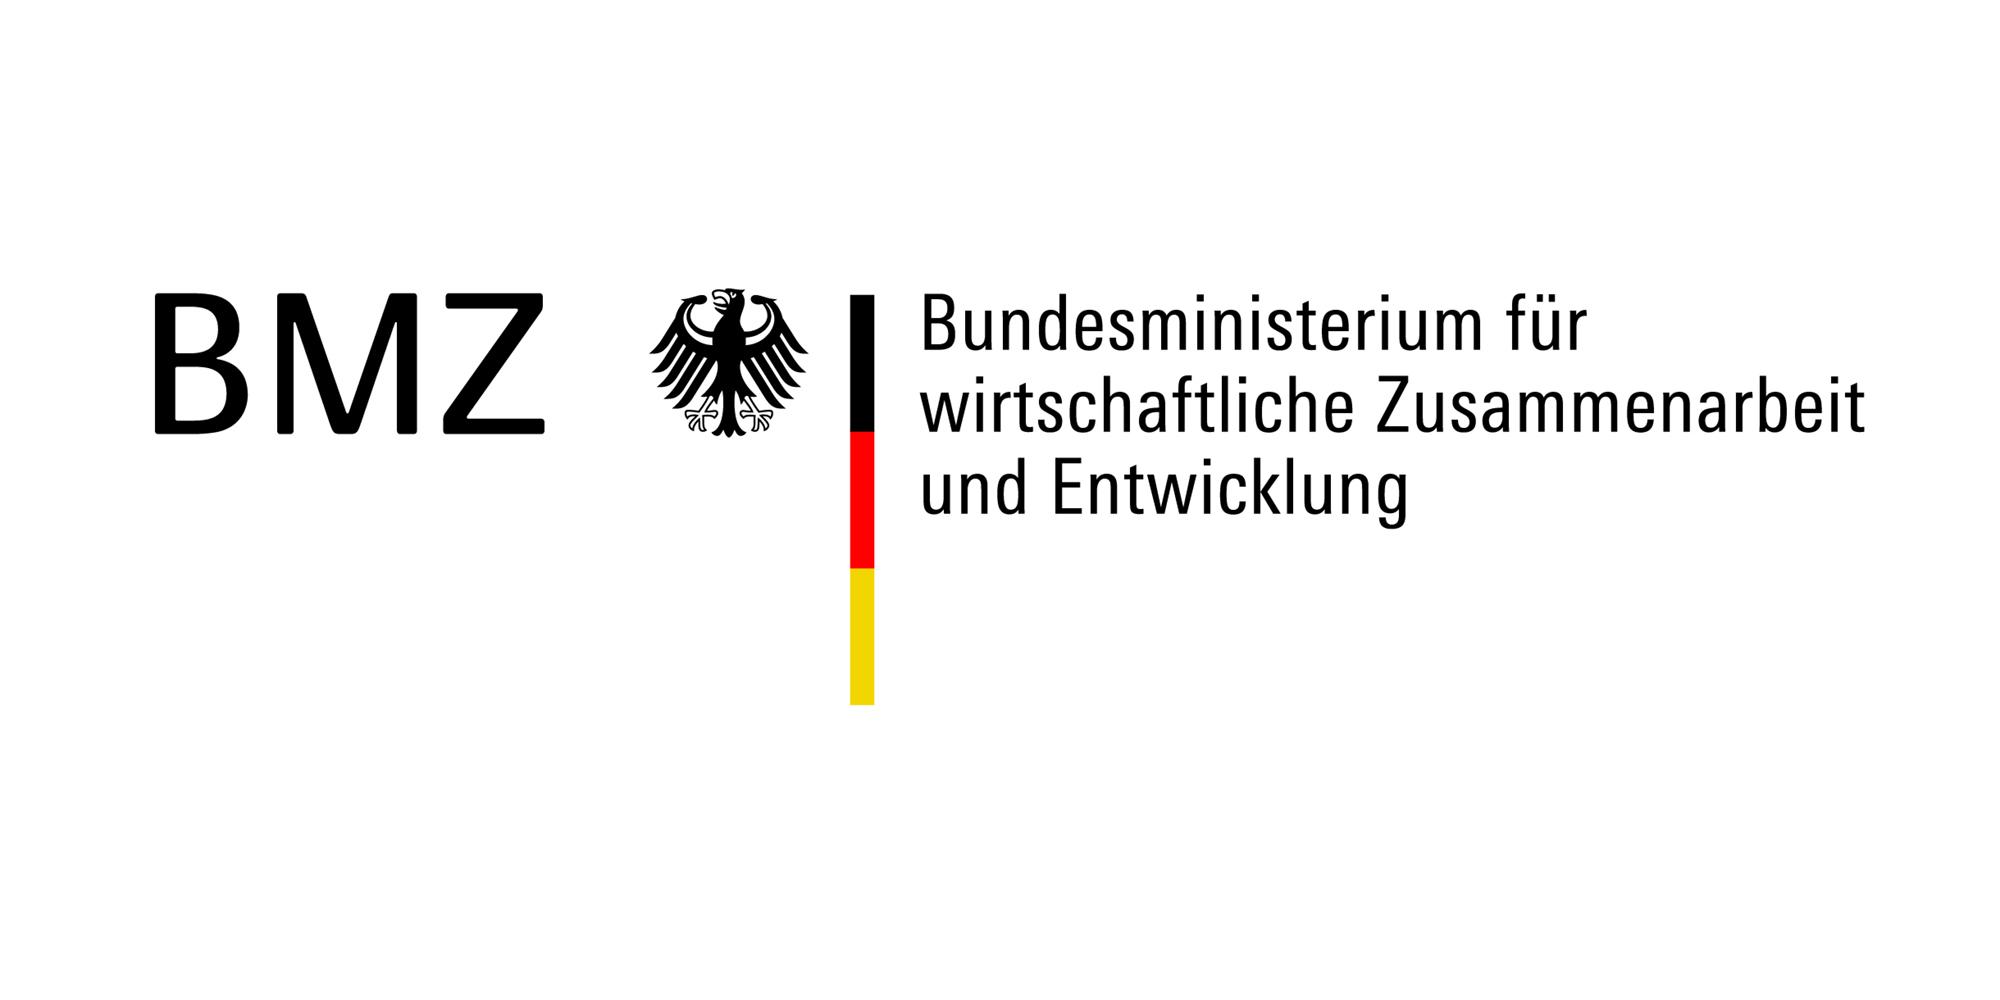 BMZ-Logo_2000x1000.jpg